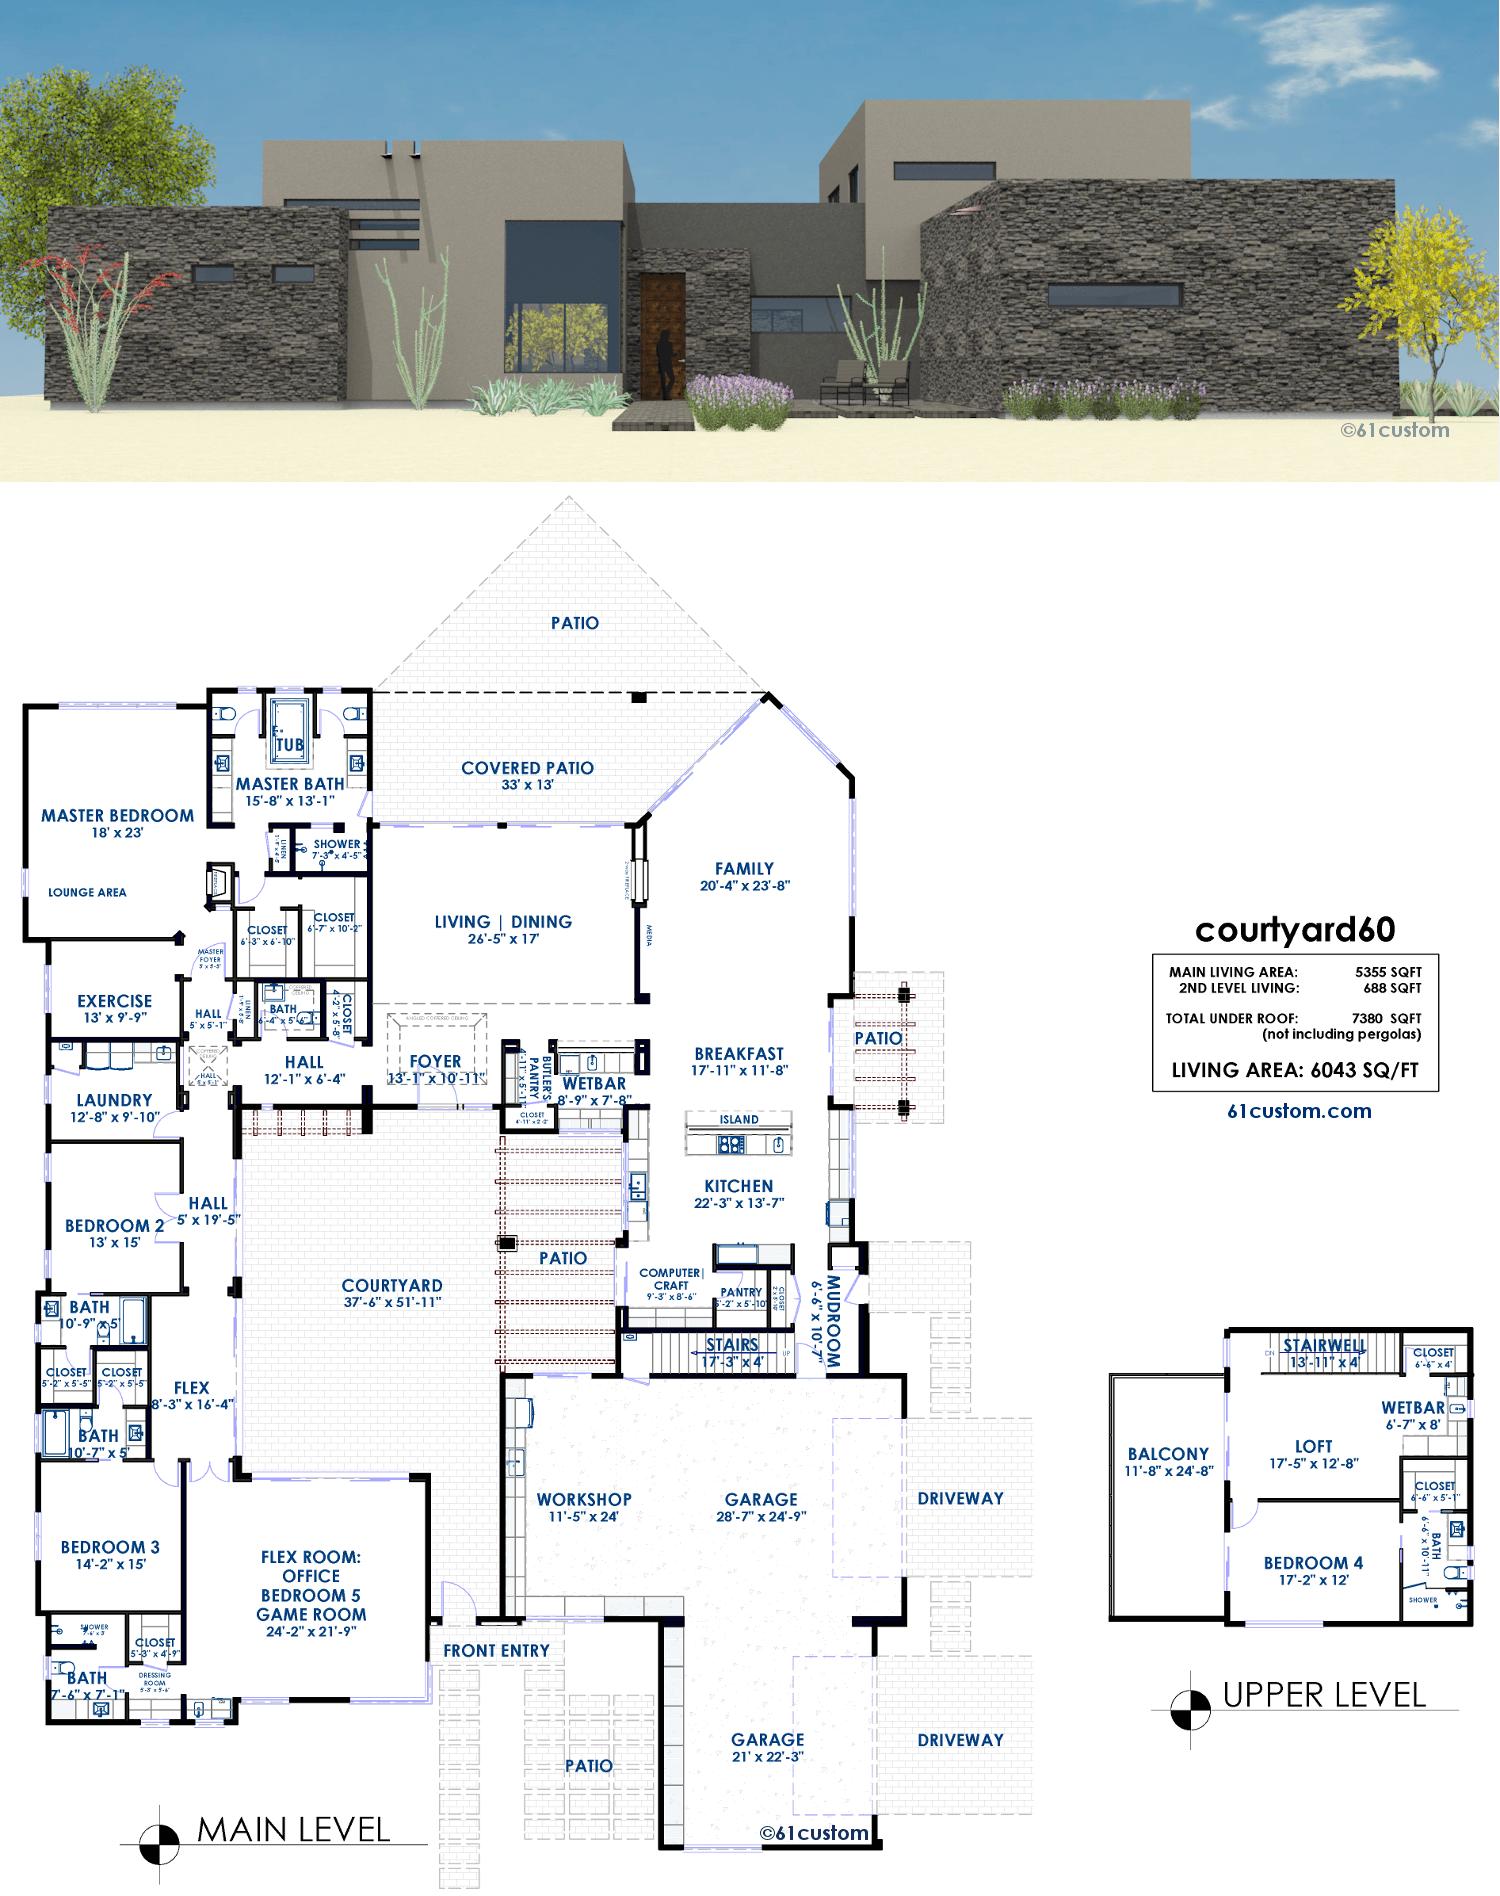 courtyard60 luxury modern house plan 61custom contemporary